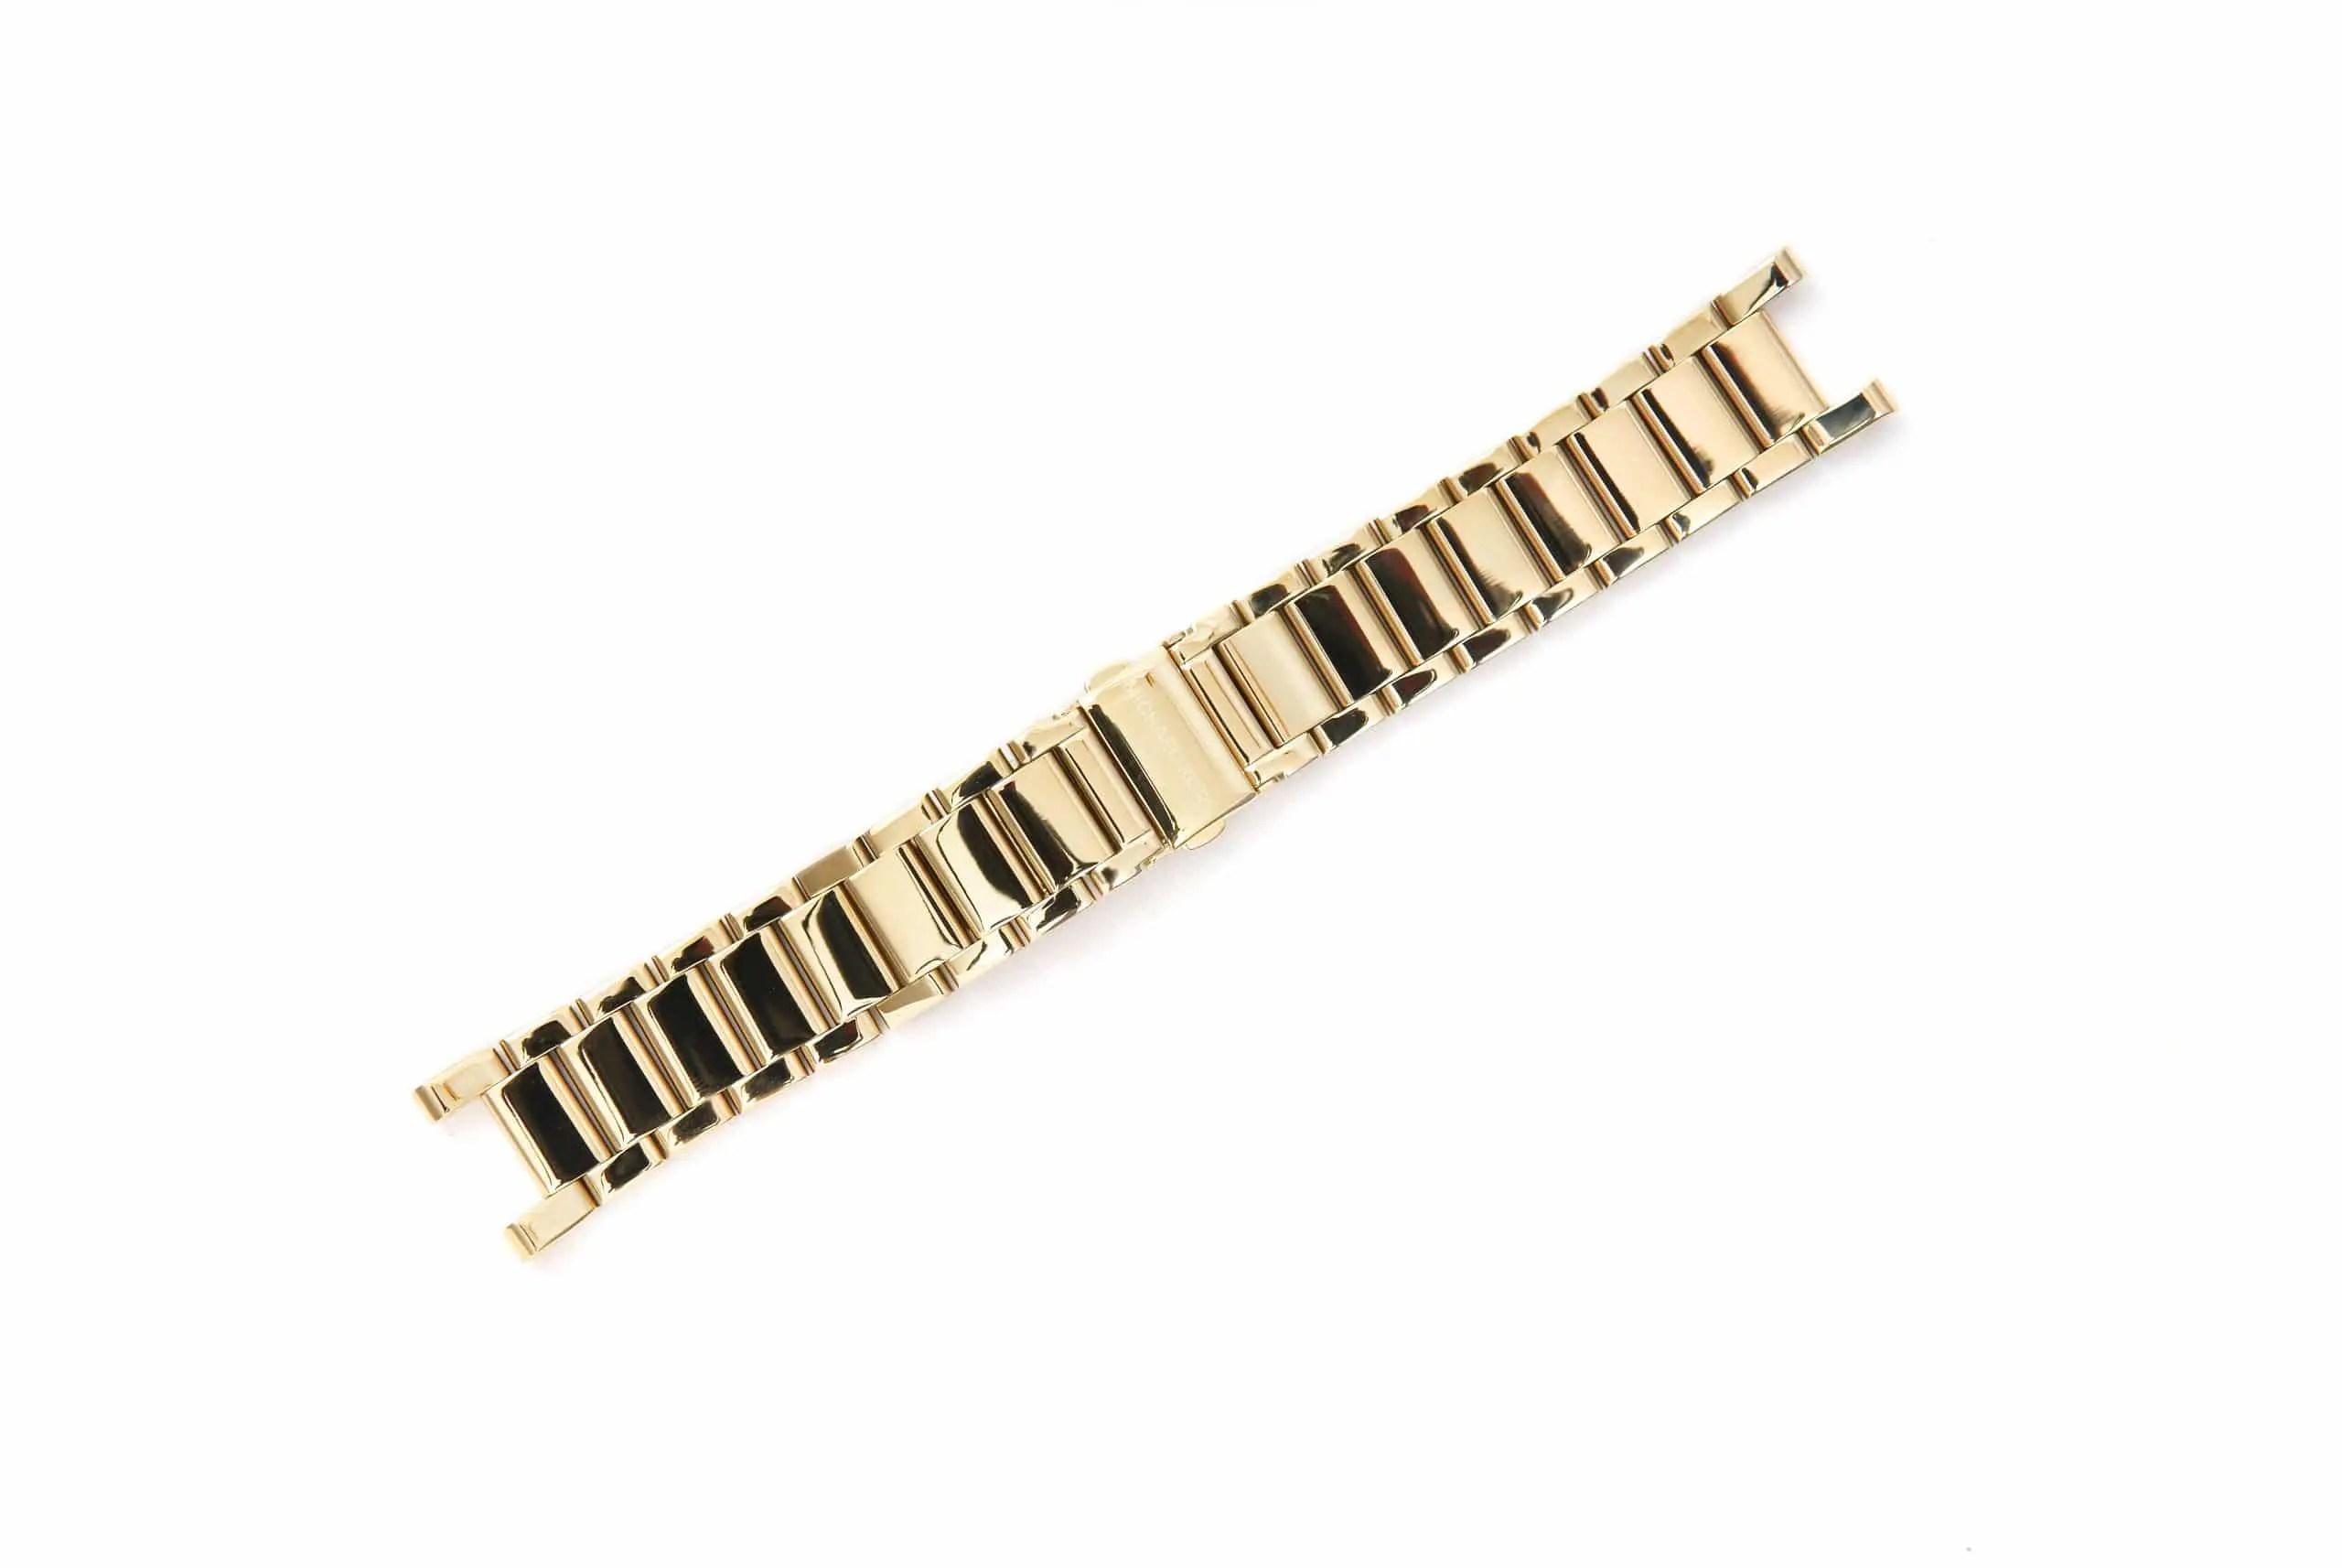 6080bf87682c MICHAEL KORS BRACELET MK5354 - Atoz Watch and Jewellery Repair